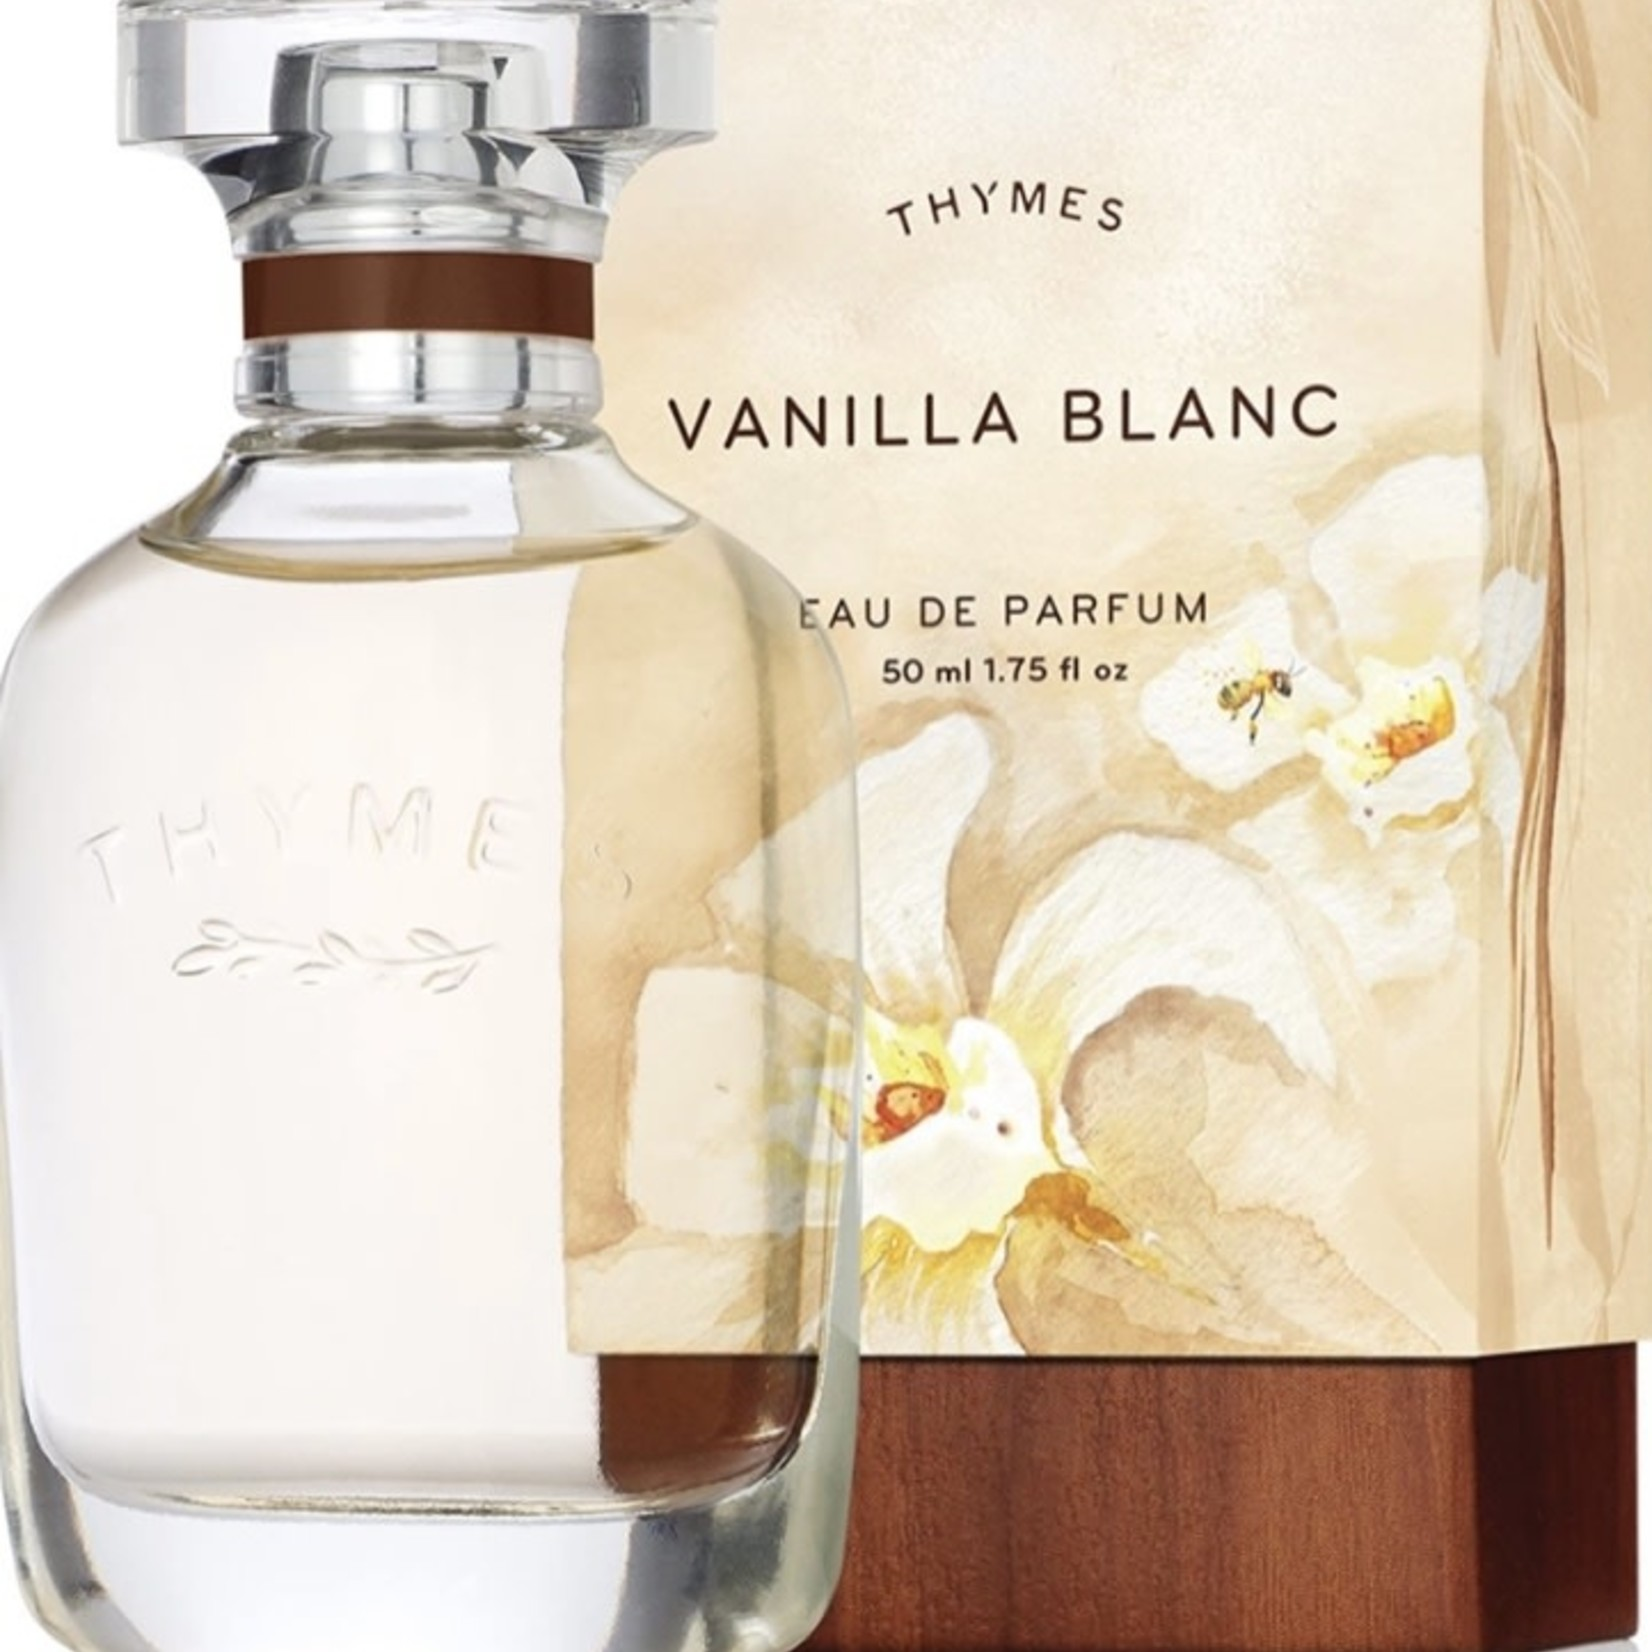 Thymes vanilla blanc parfum